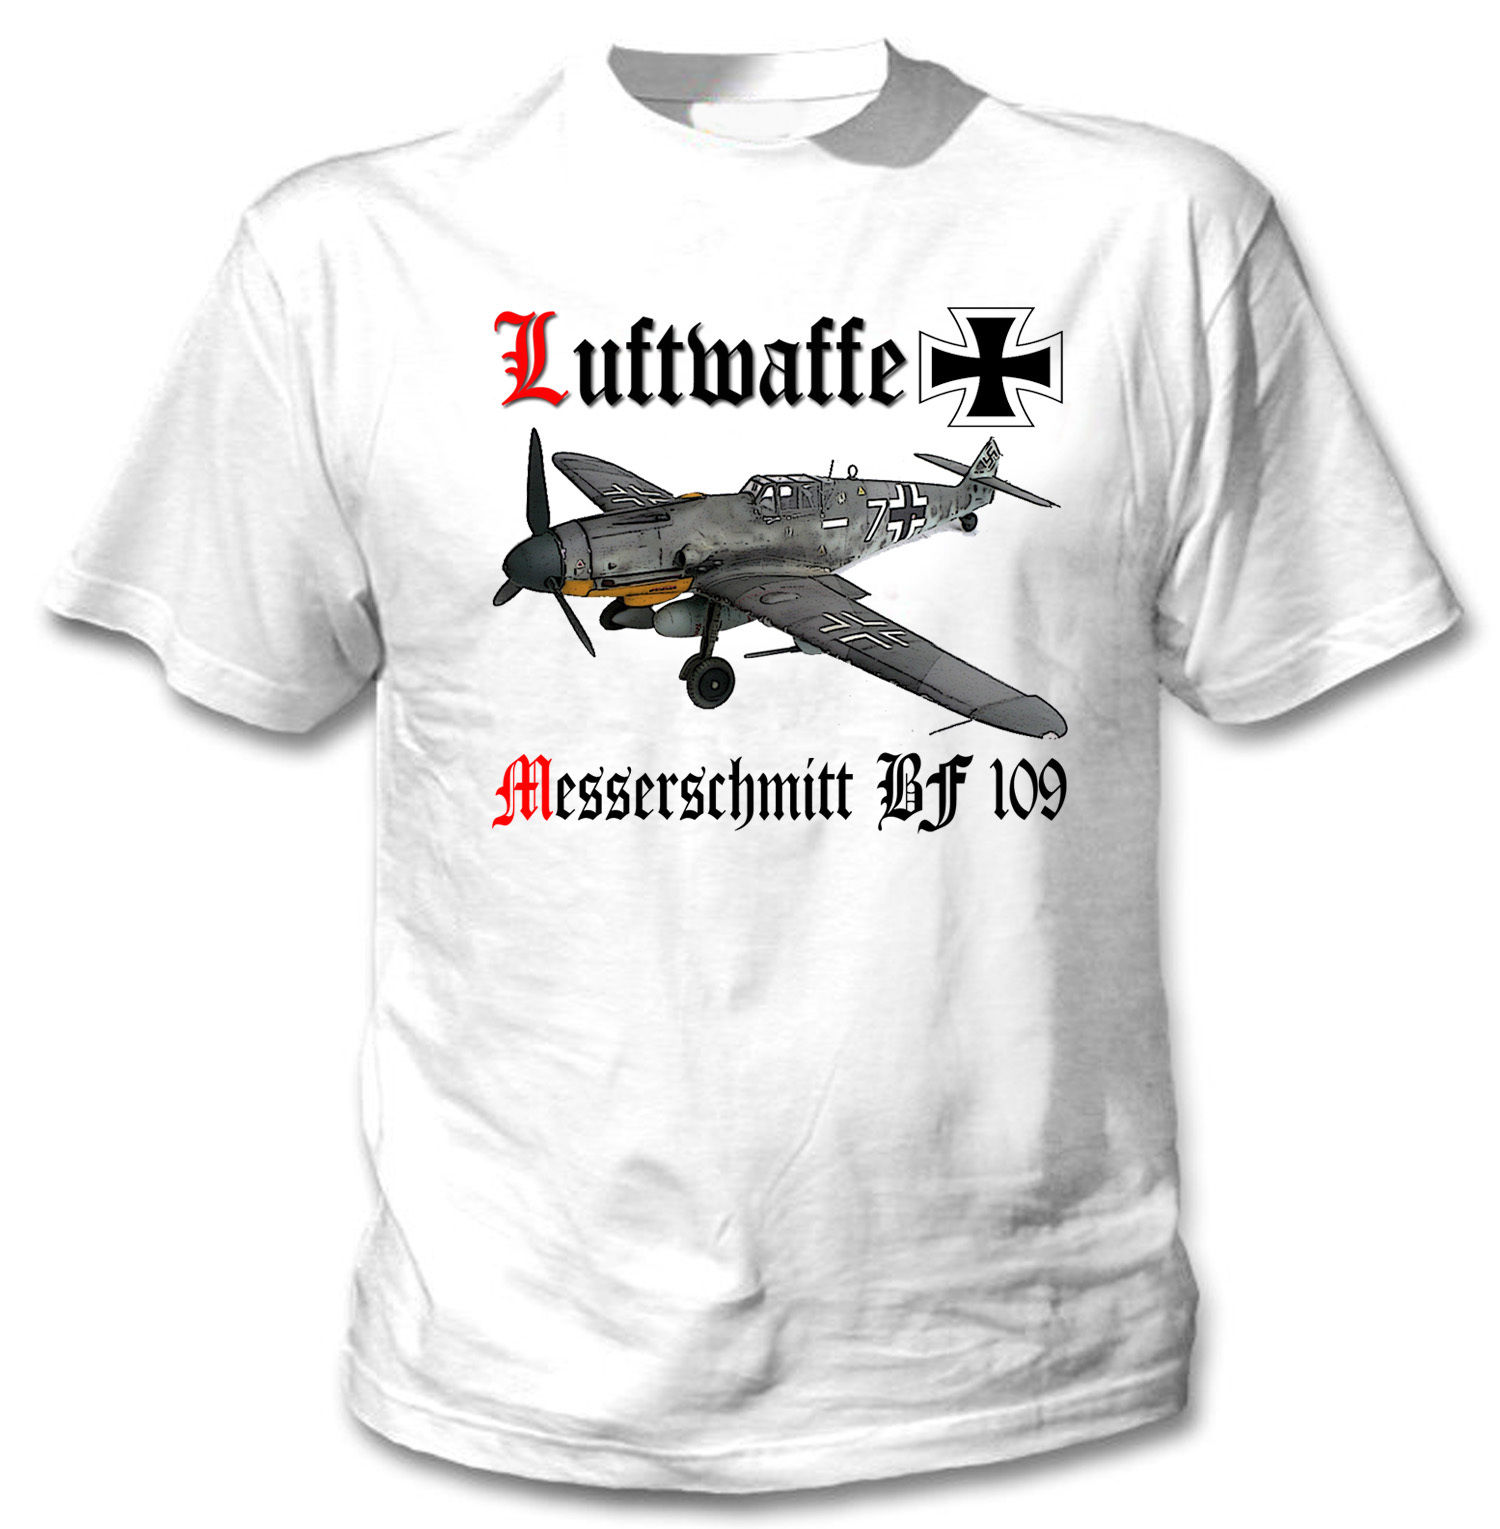 Nueva moda camiseta Messerschmitt Bf 109 Germany de la segunda guerra mundial...